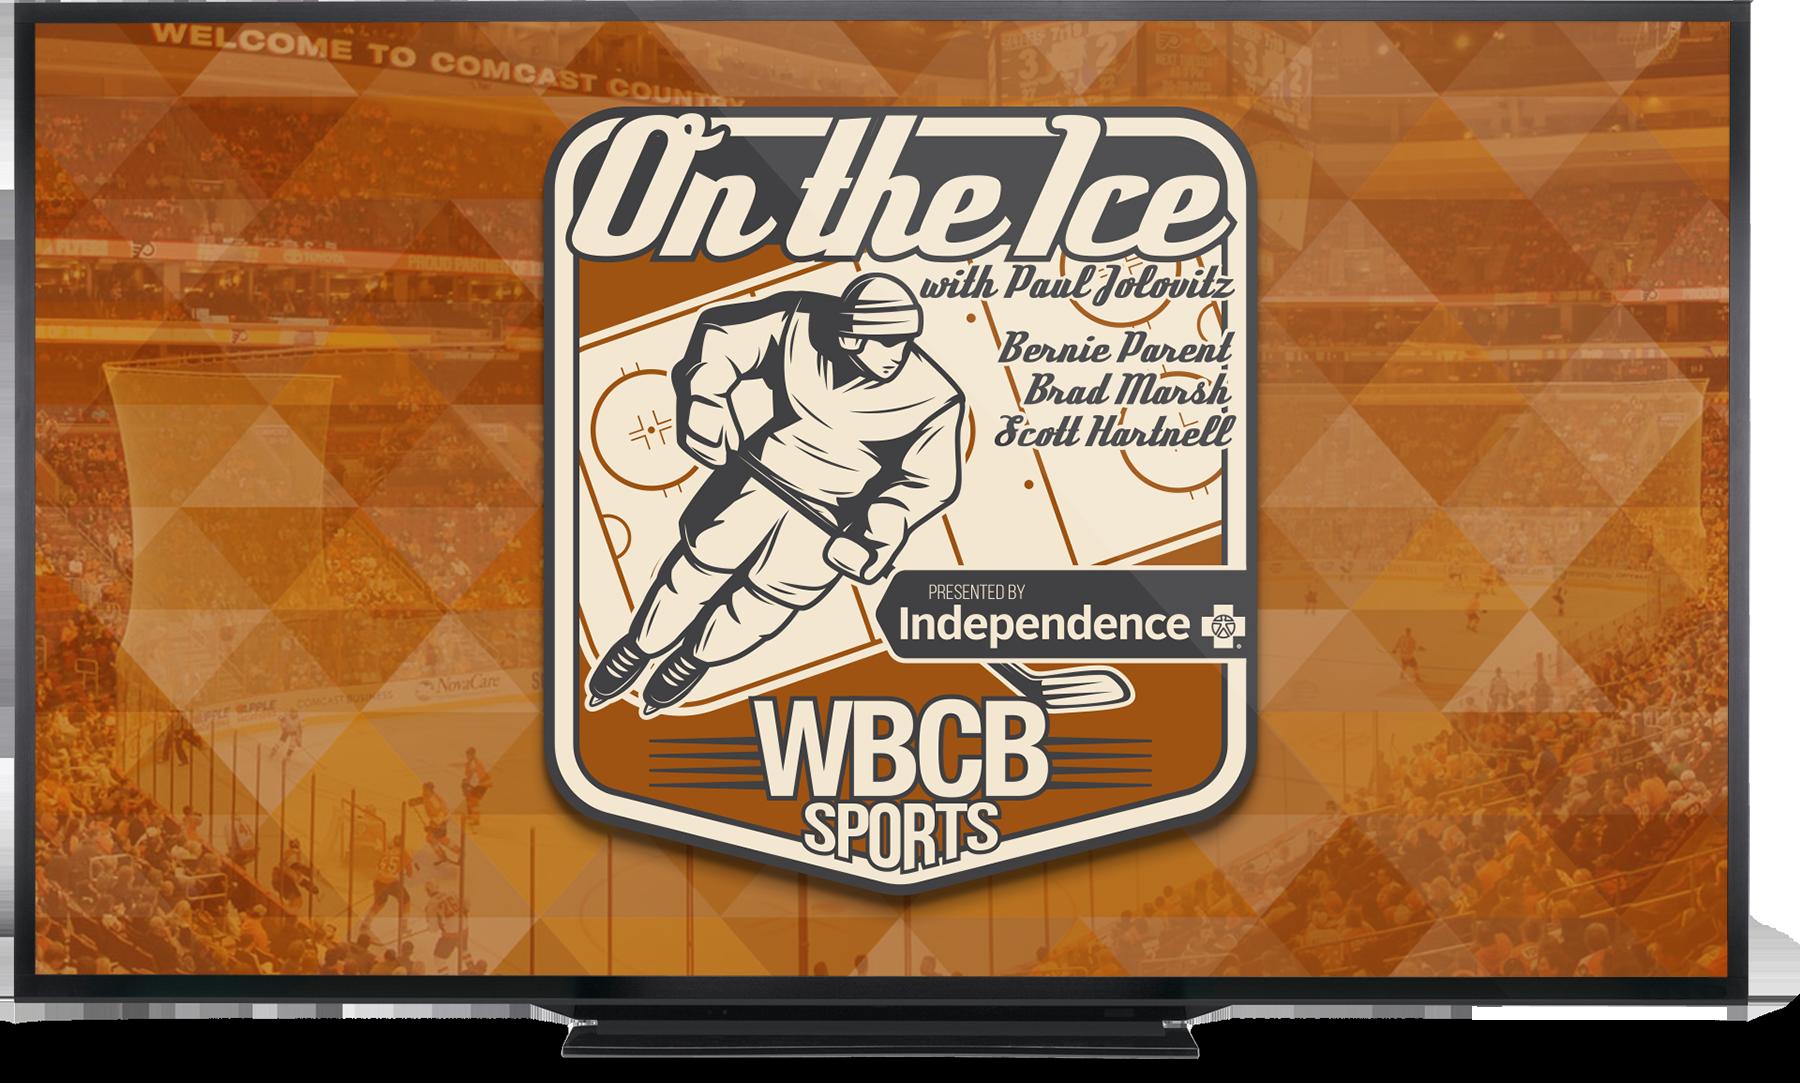 Watch On the Ice with Paul Jolovitz live on WBCB Sports